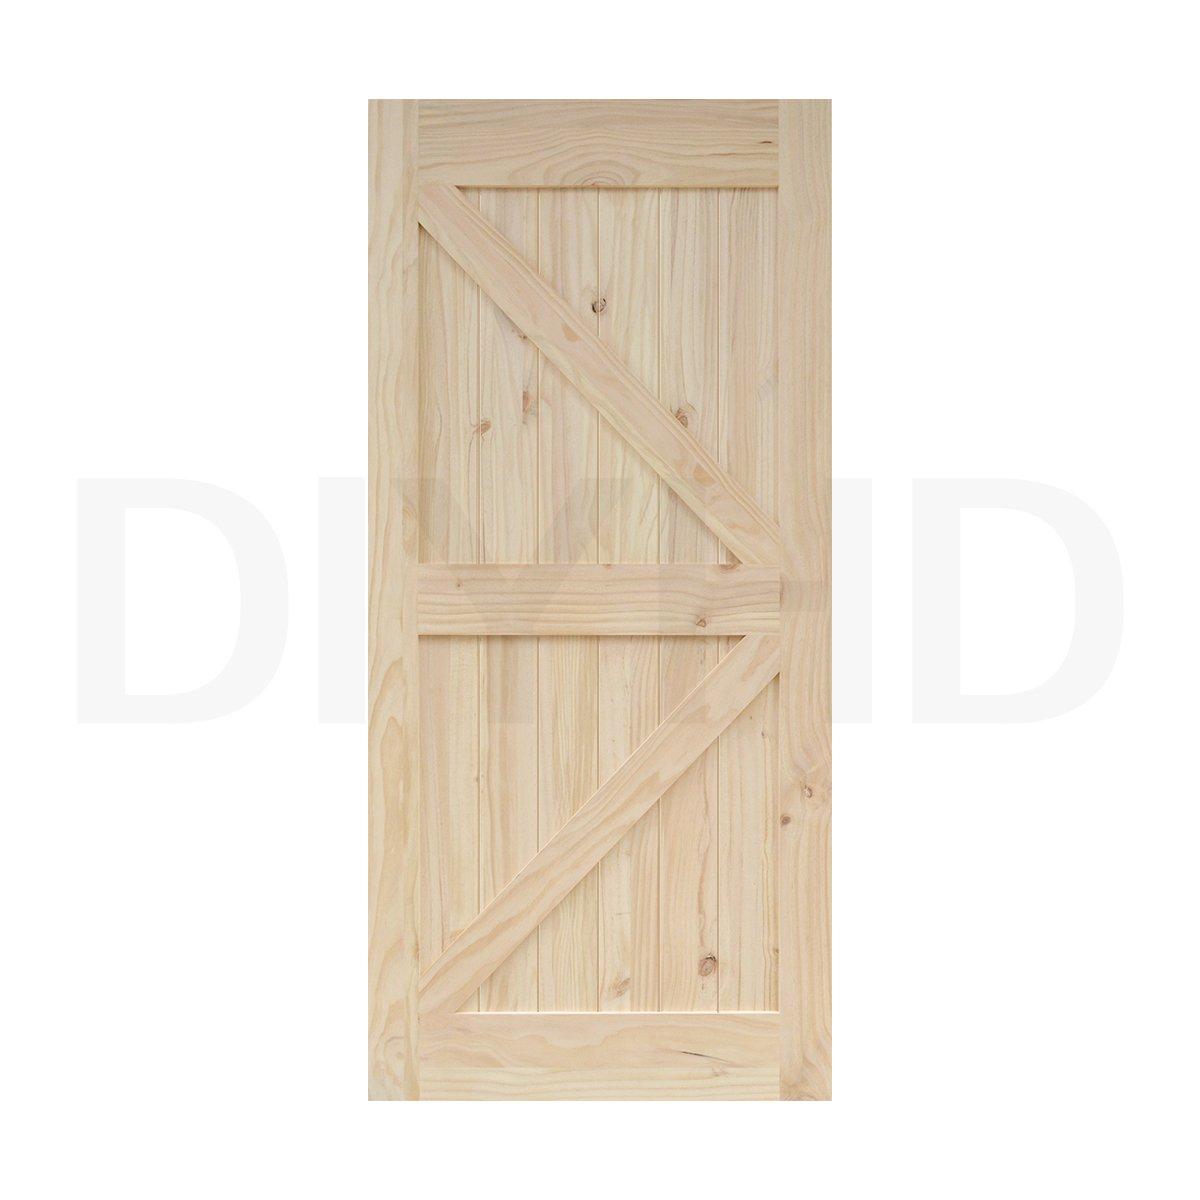 Amazon Diyhd 30 In84 In Pine Knotty Sliding Barn Wood Door Slab